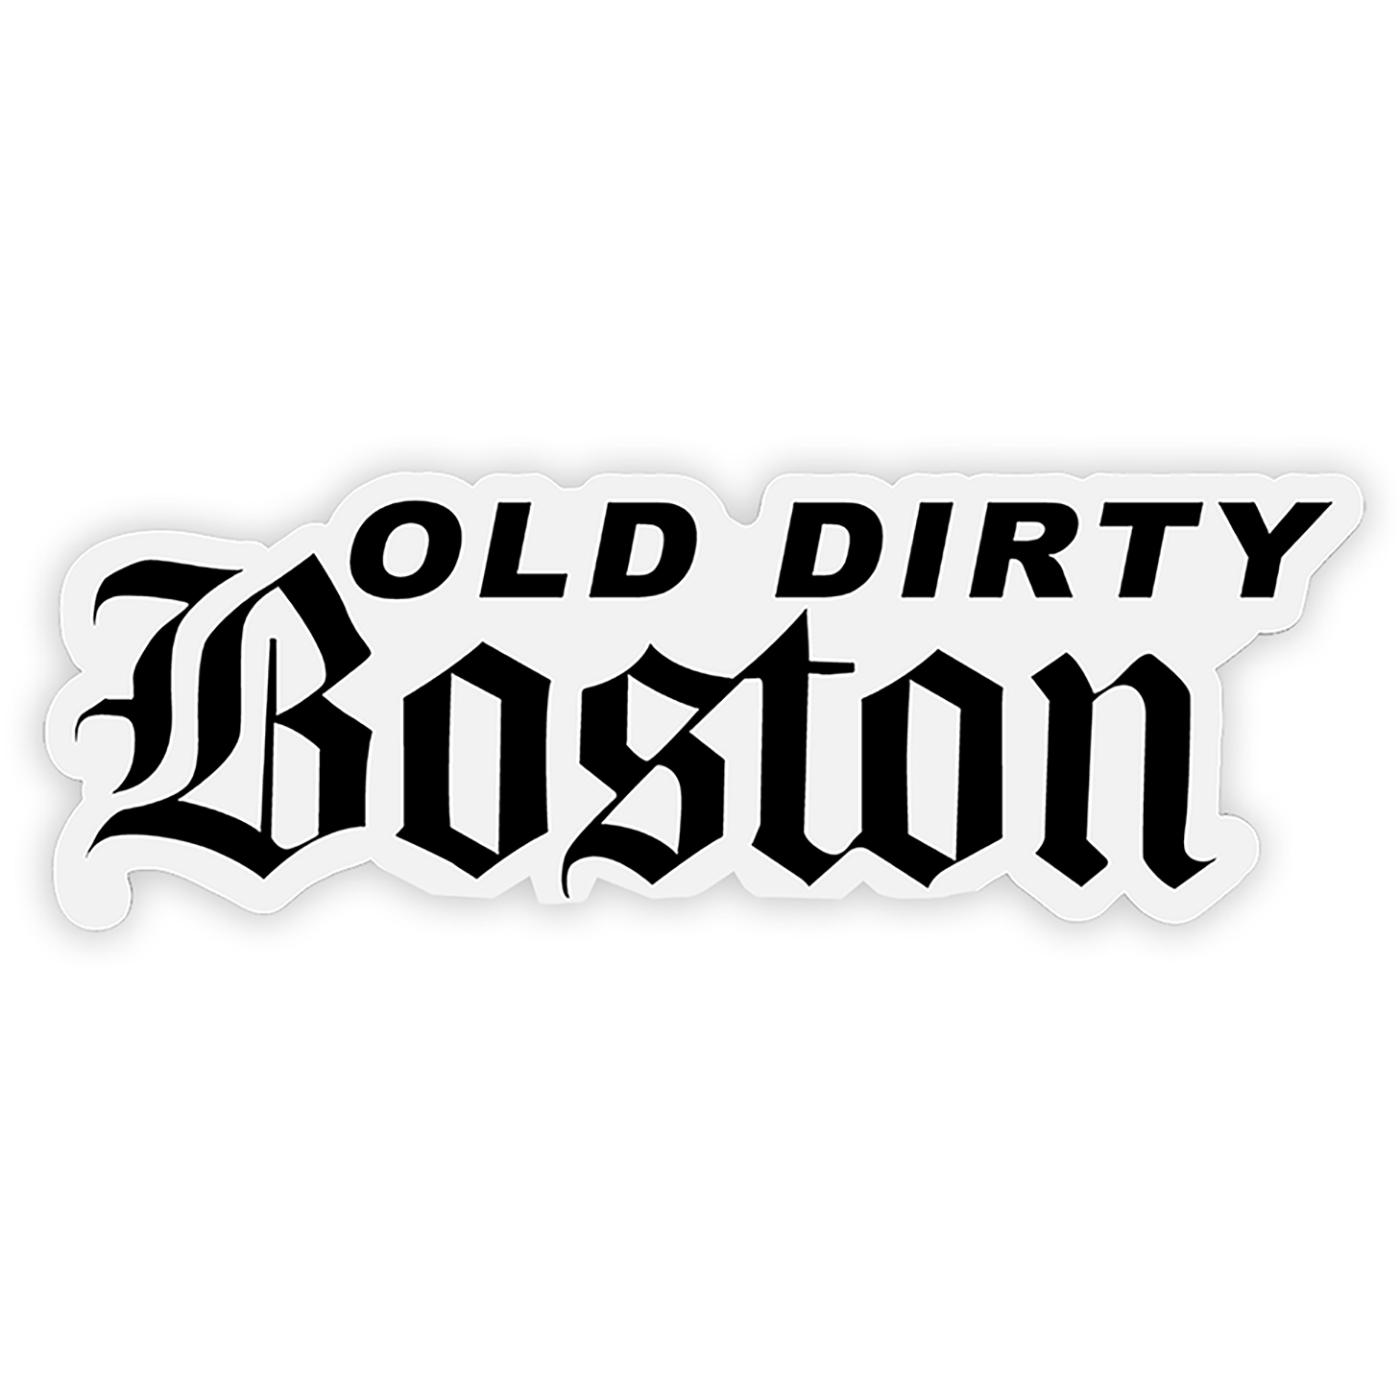 Old Dirty Boston show art